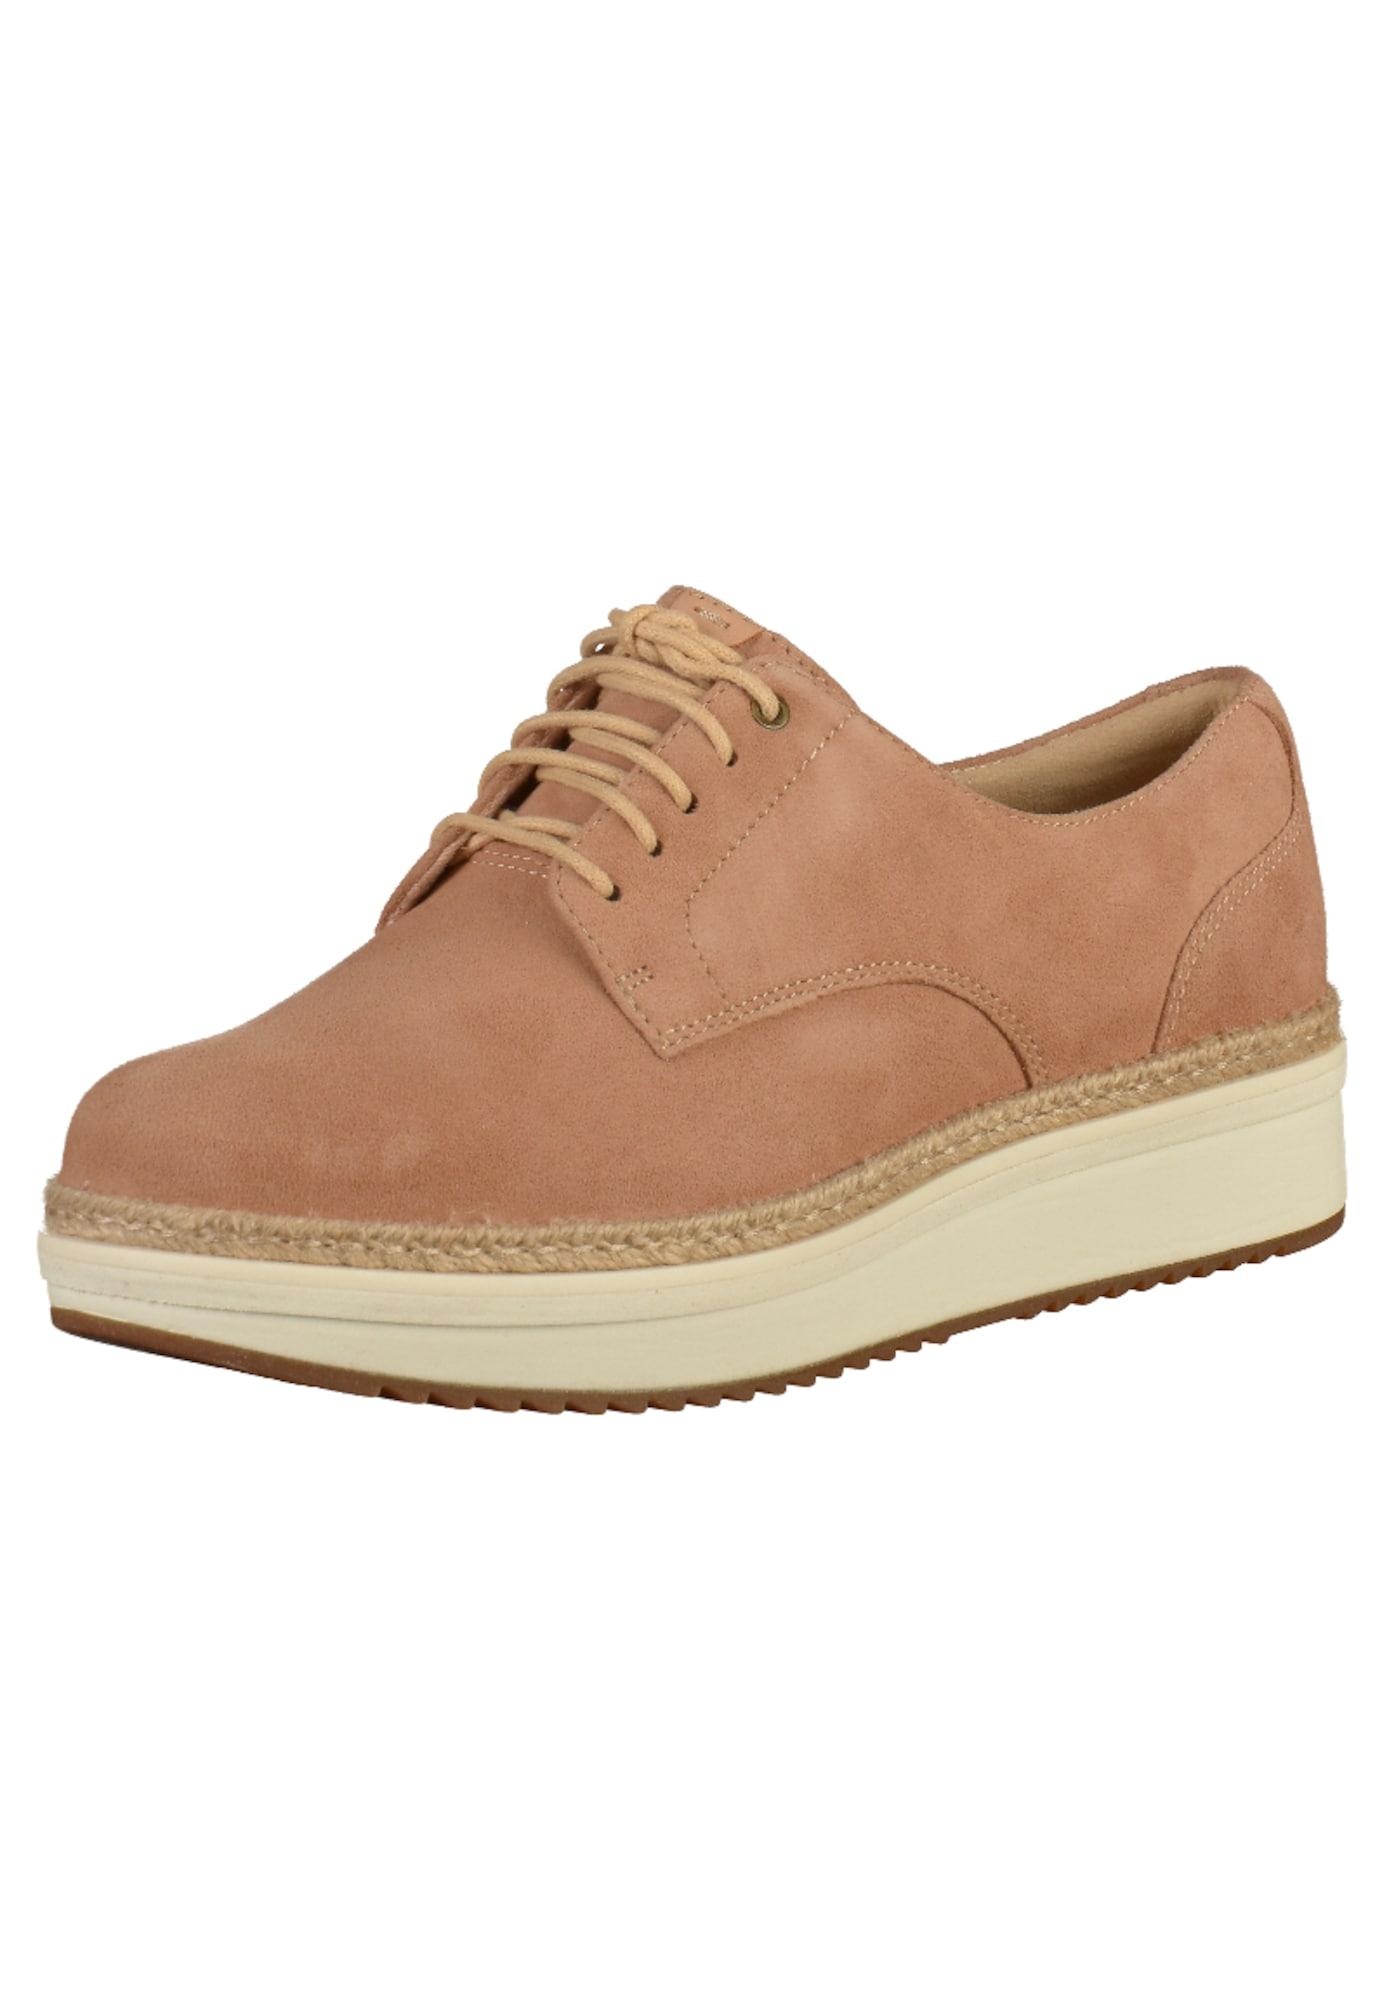 Halbschuhe | Schuhe > Boots > Schnürboots | Clarks